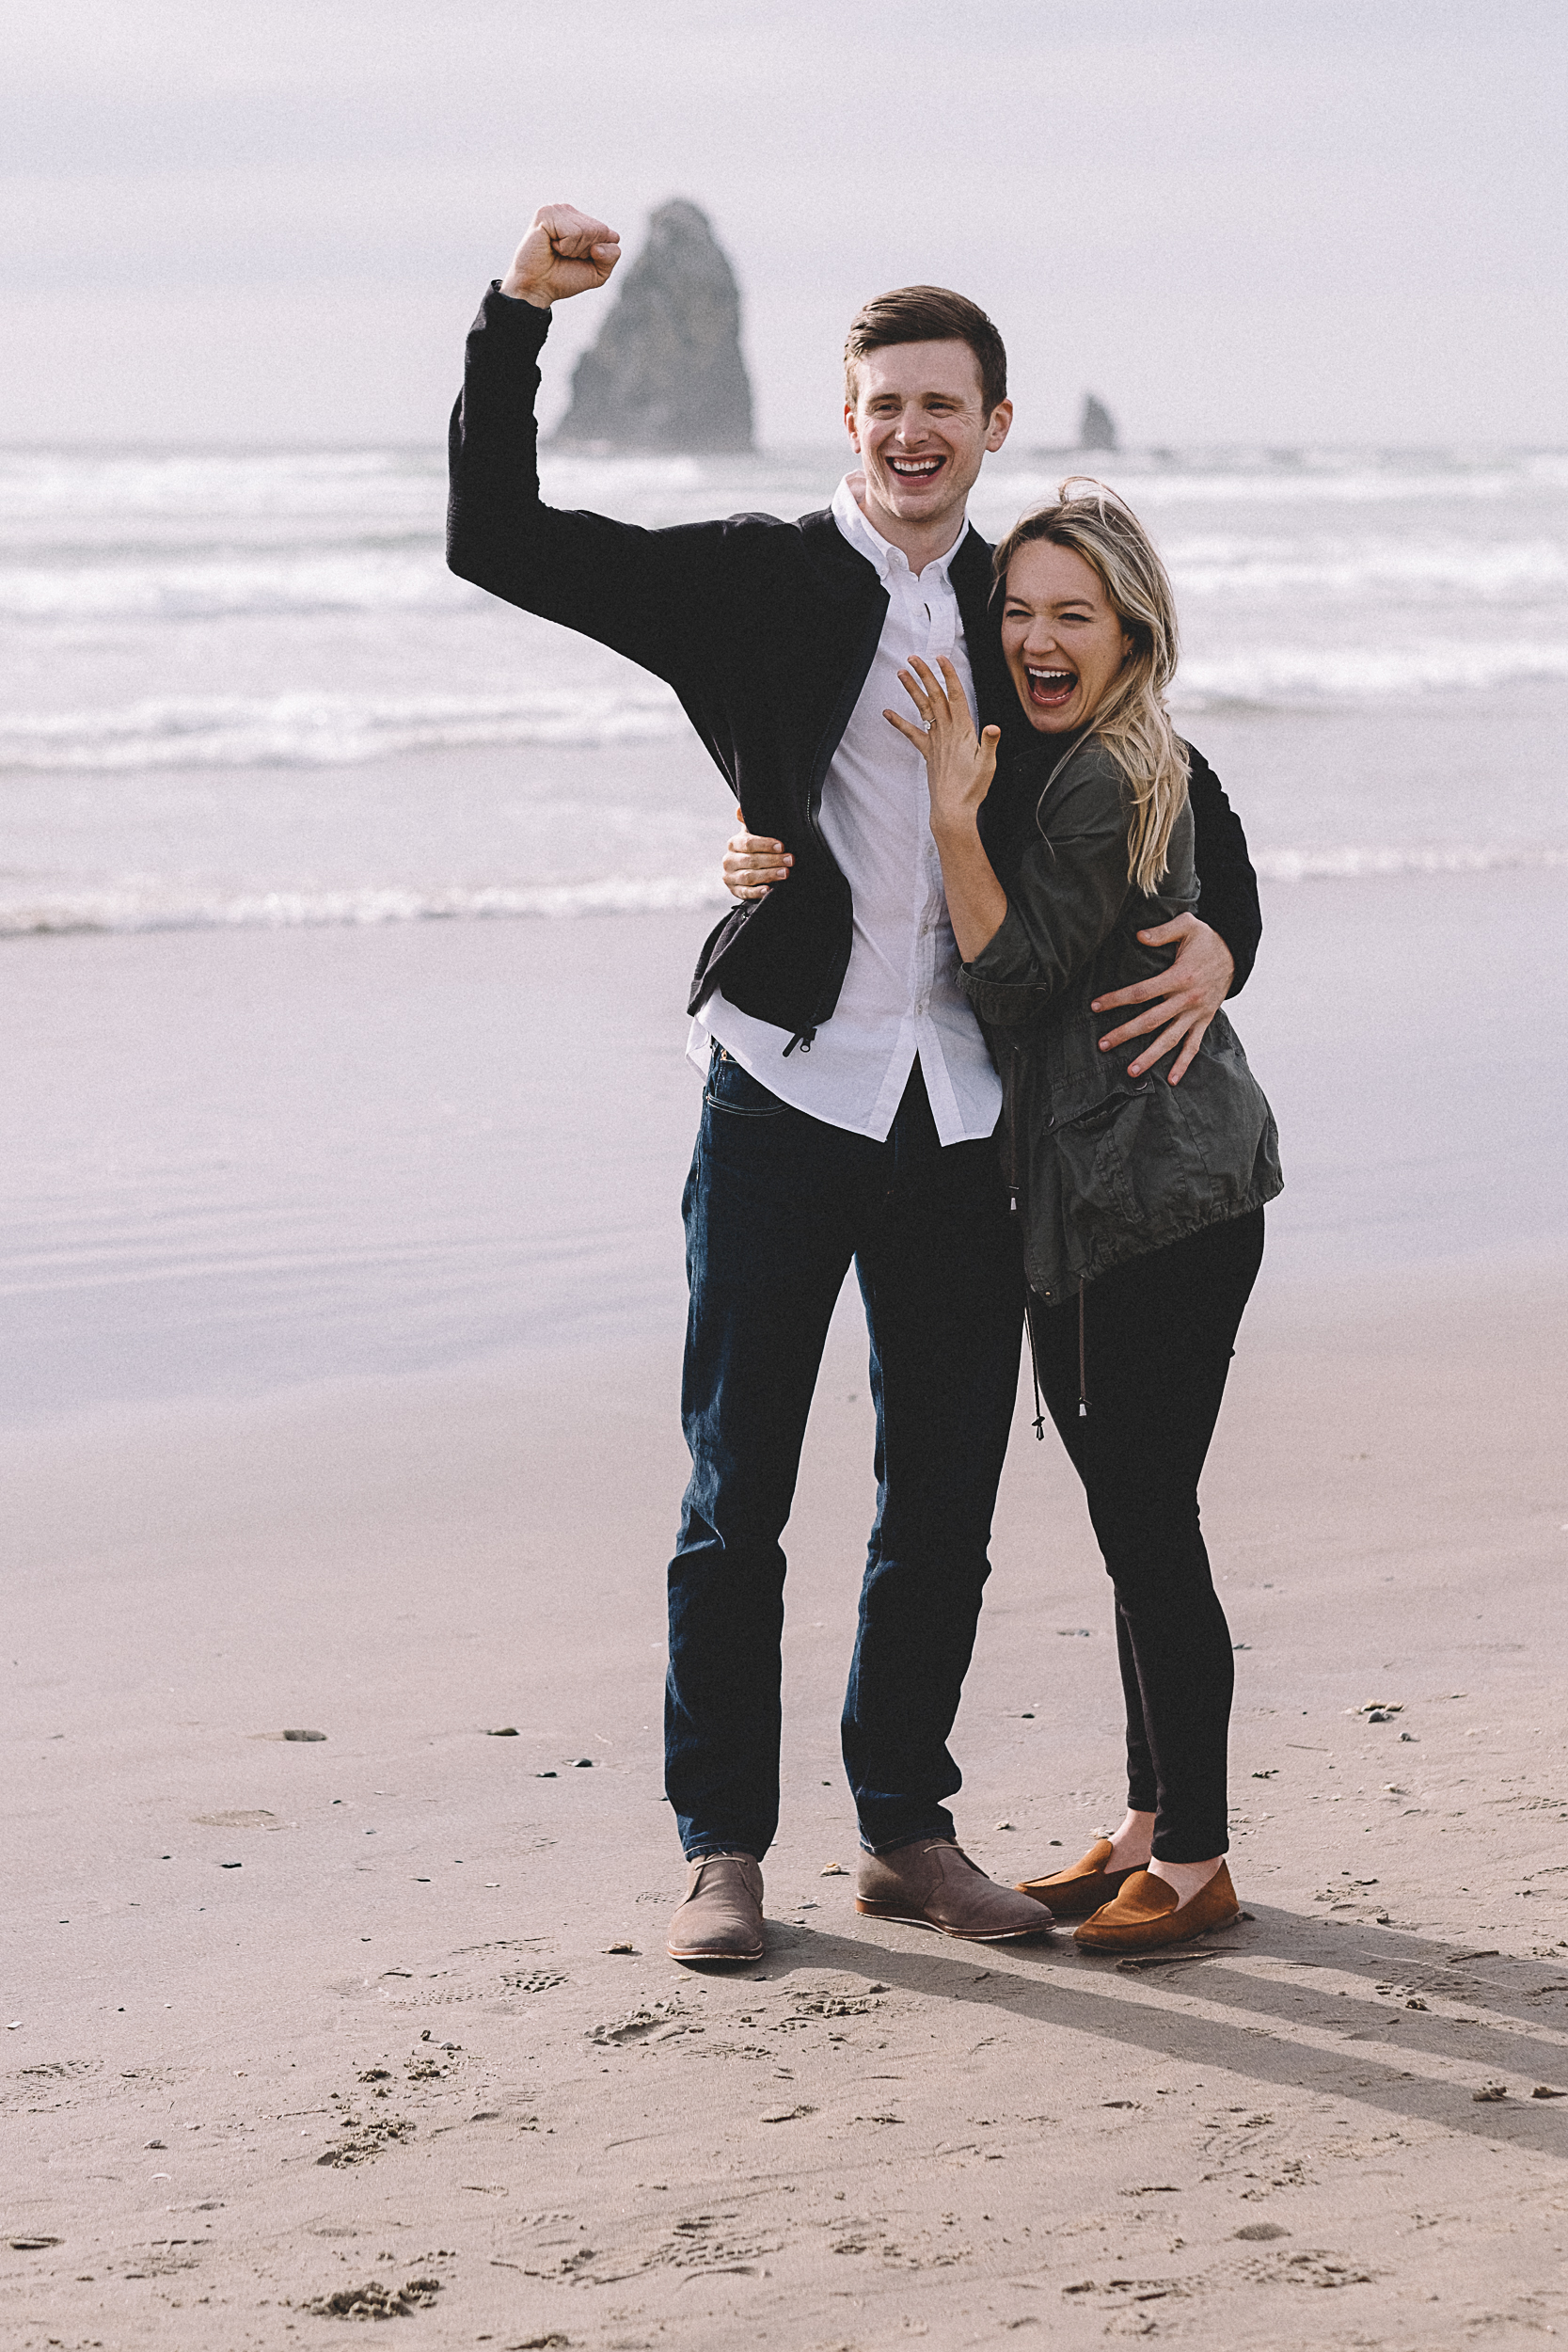 Cannon Beach Engagement Photography-28.jpg